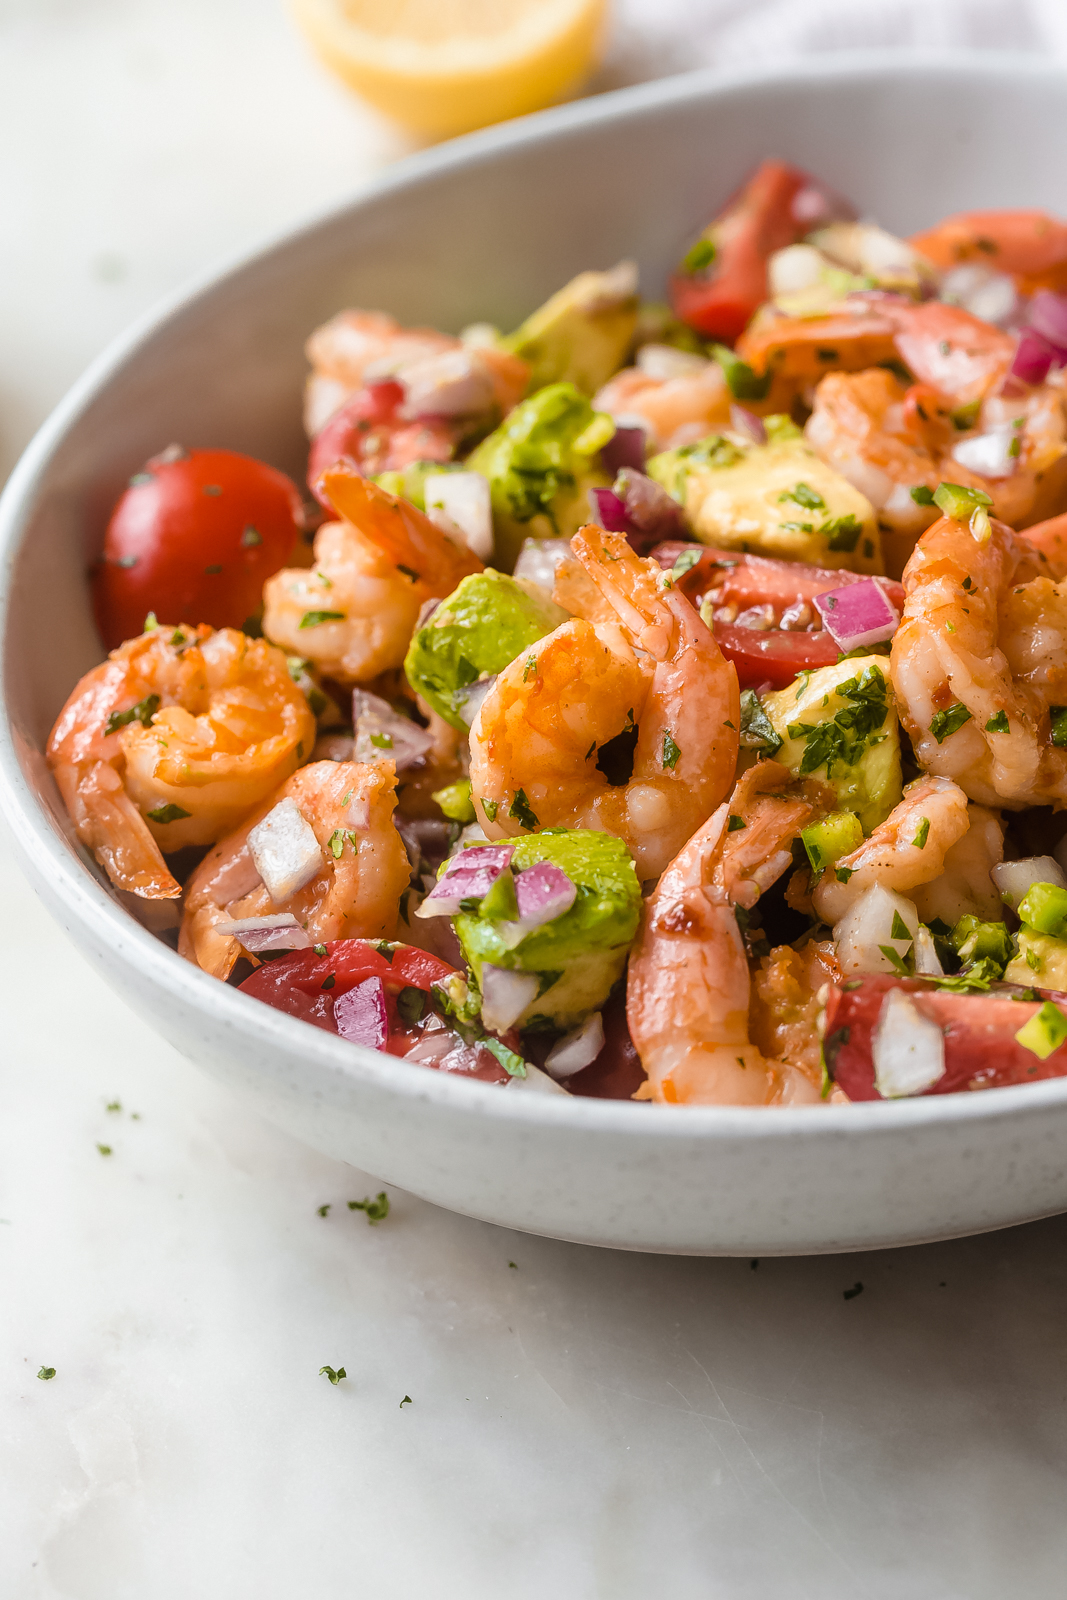 shrimp salad with avocados dressed with lemon cumin dressing